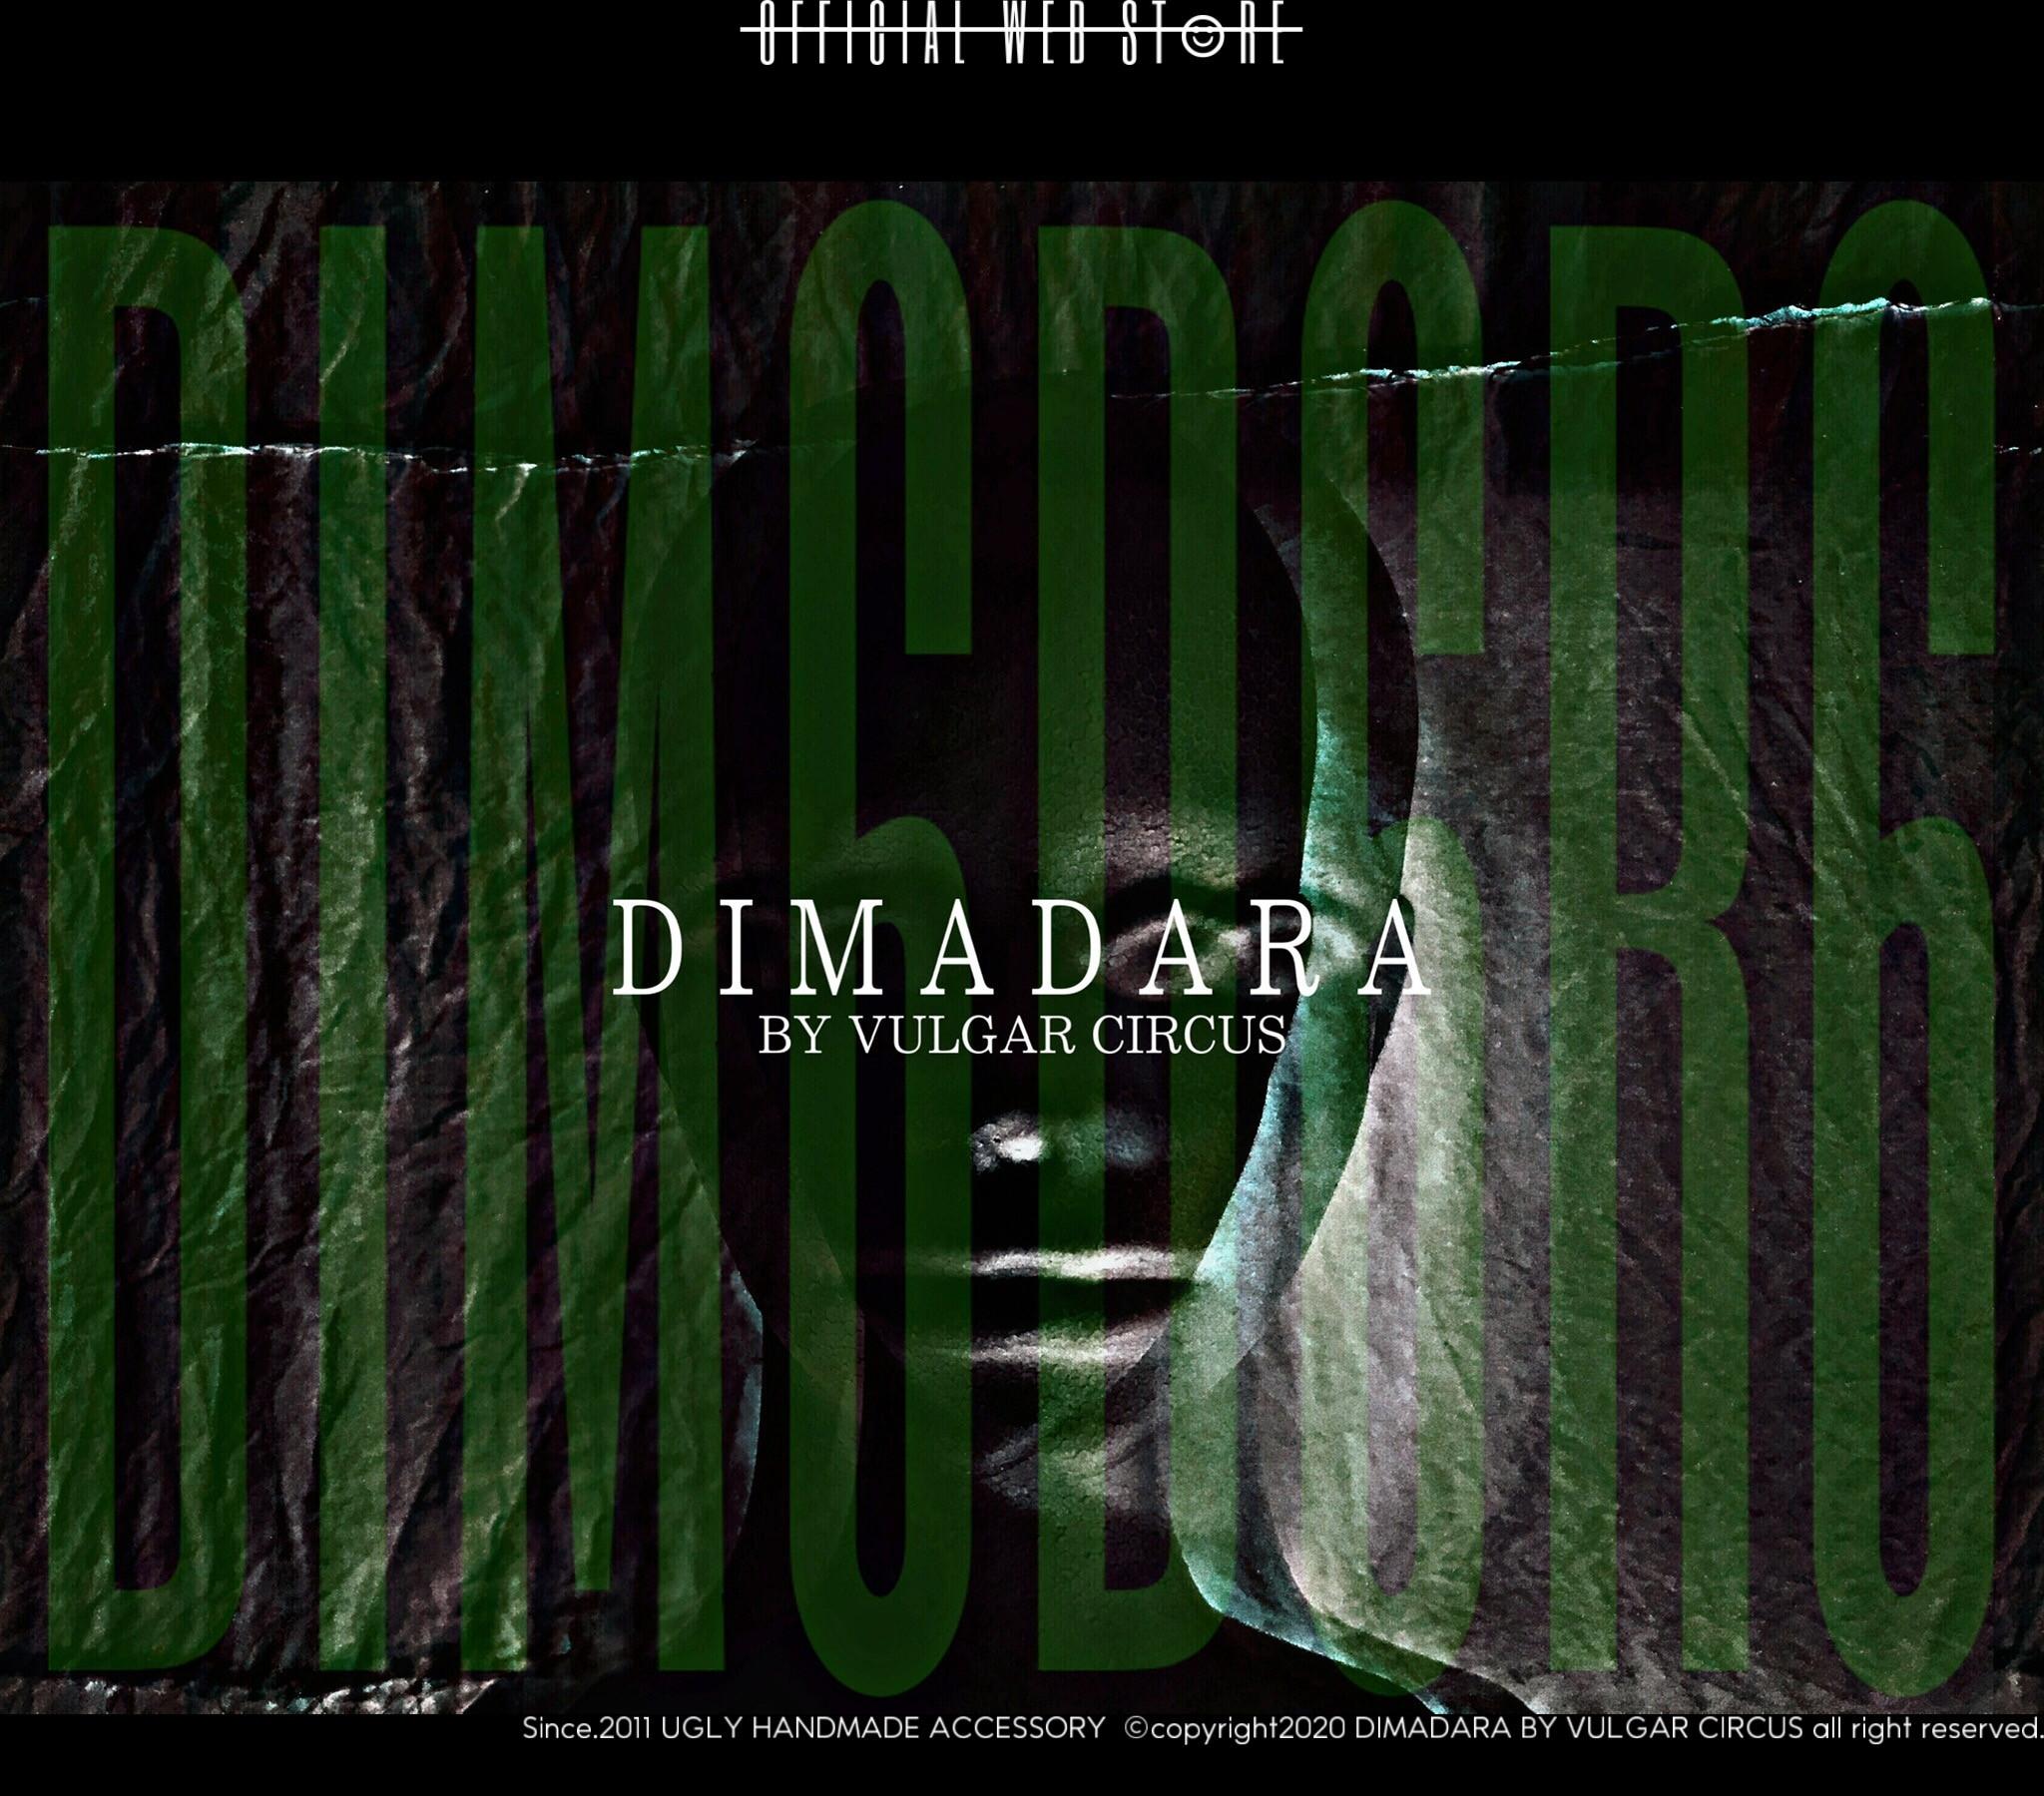 DIMADARA BY VULGAR CIRCUS | official web store